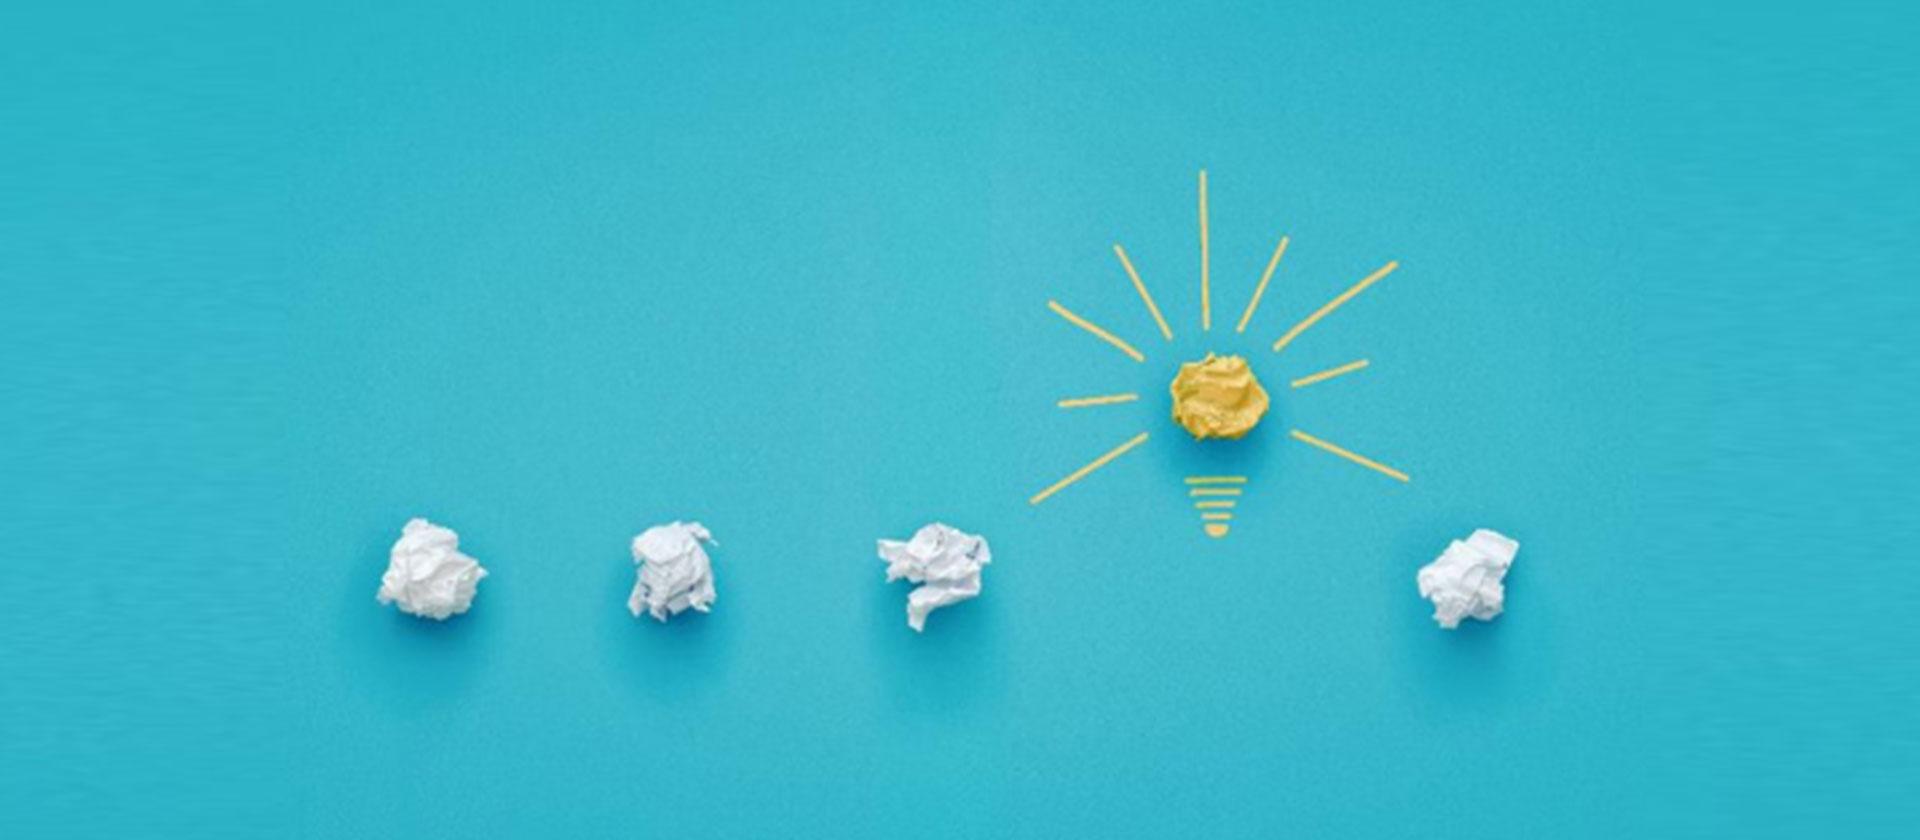 Ideas for creation